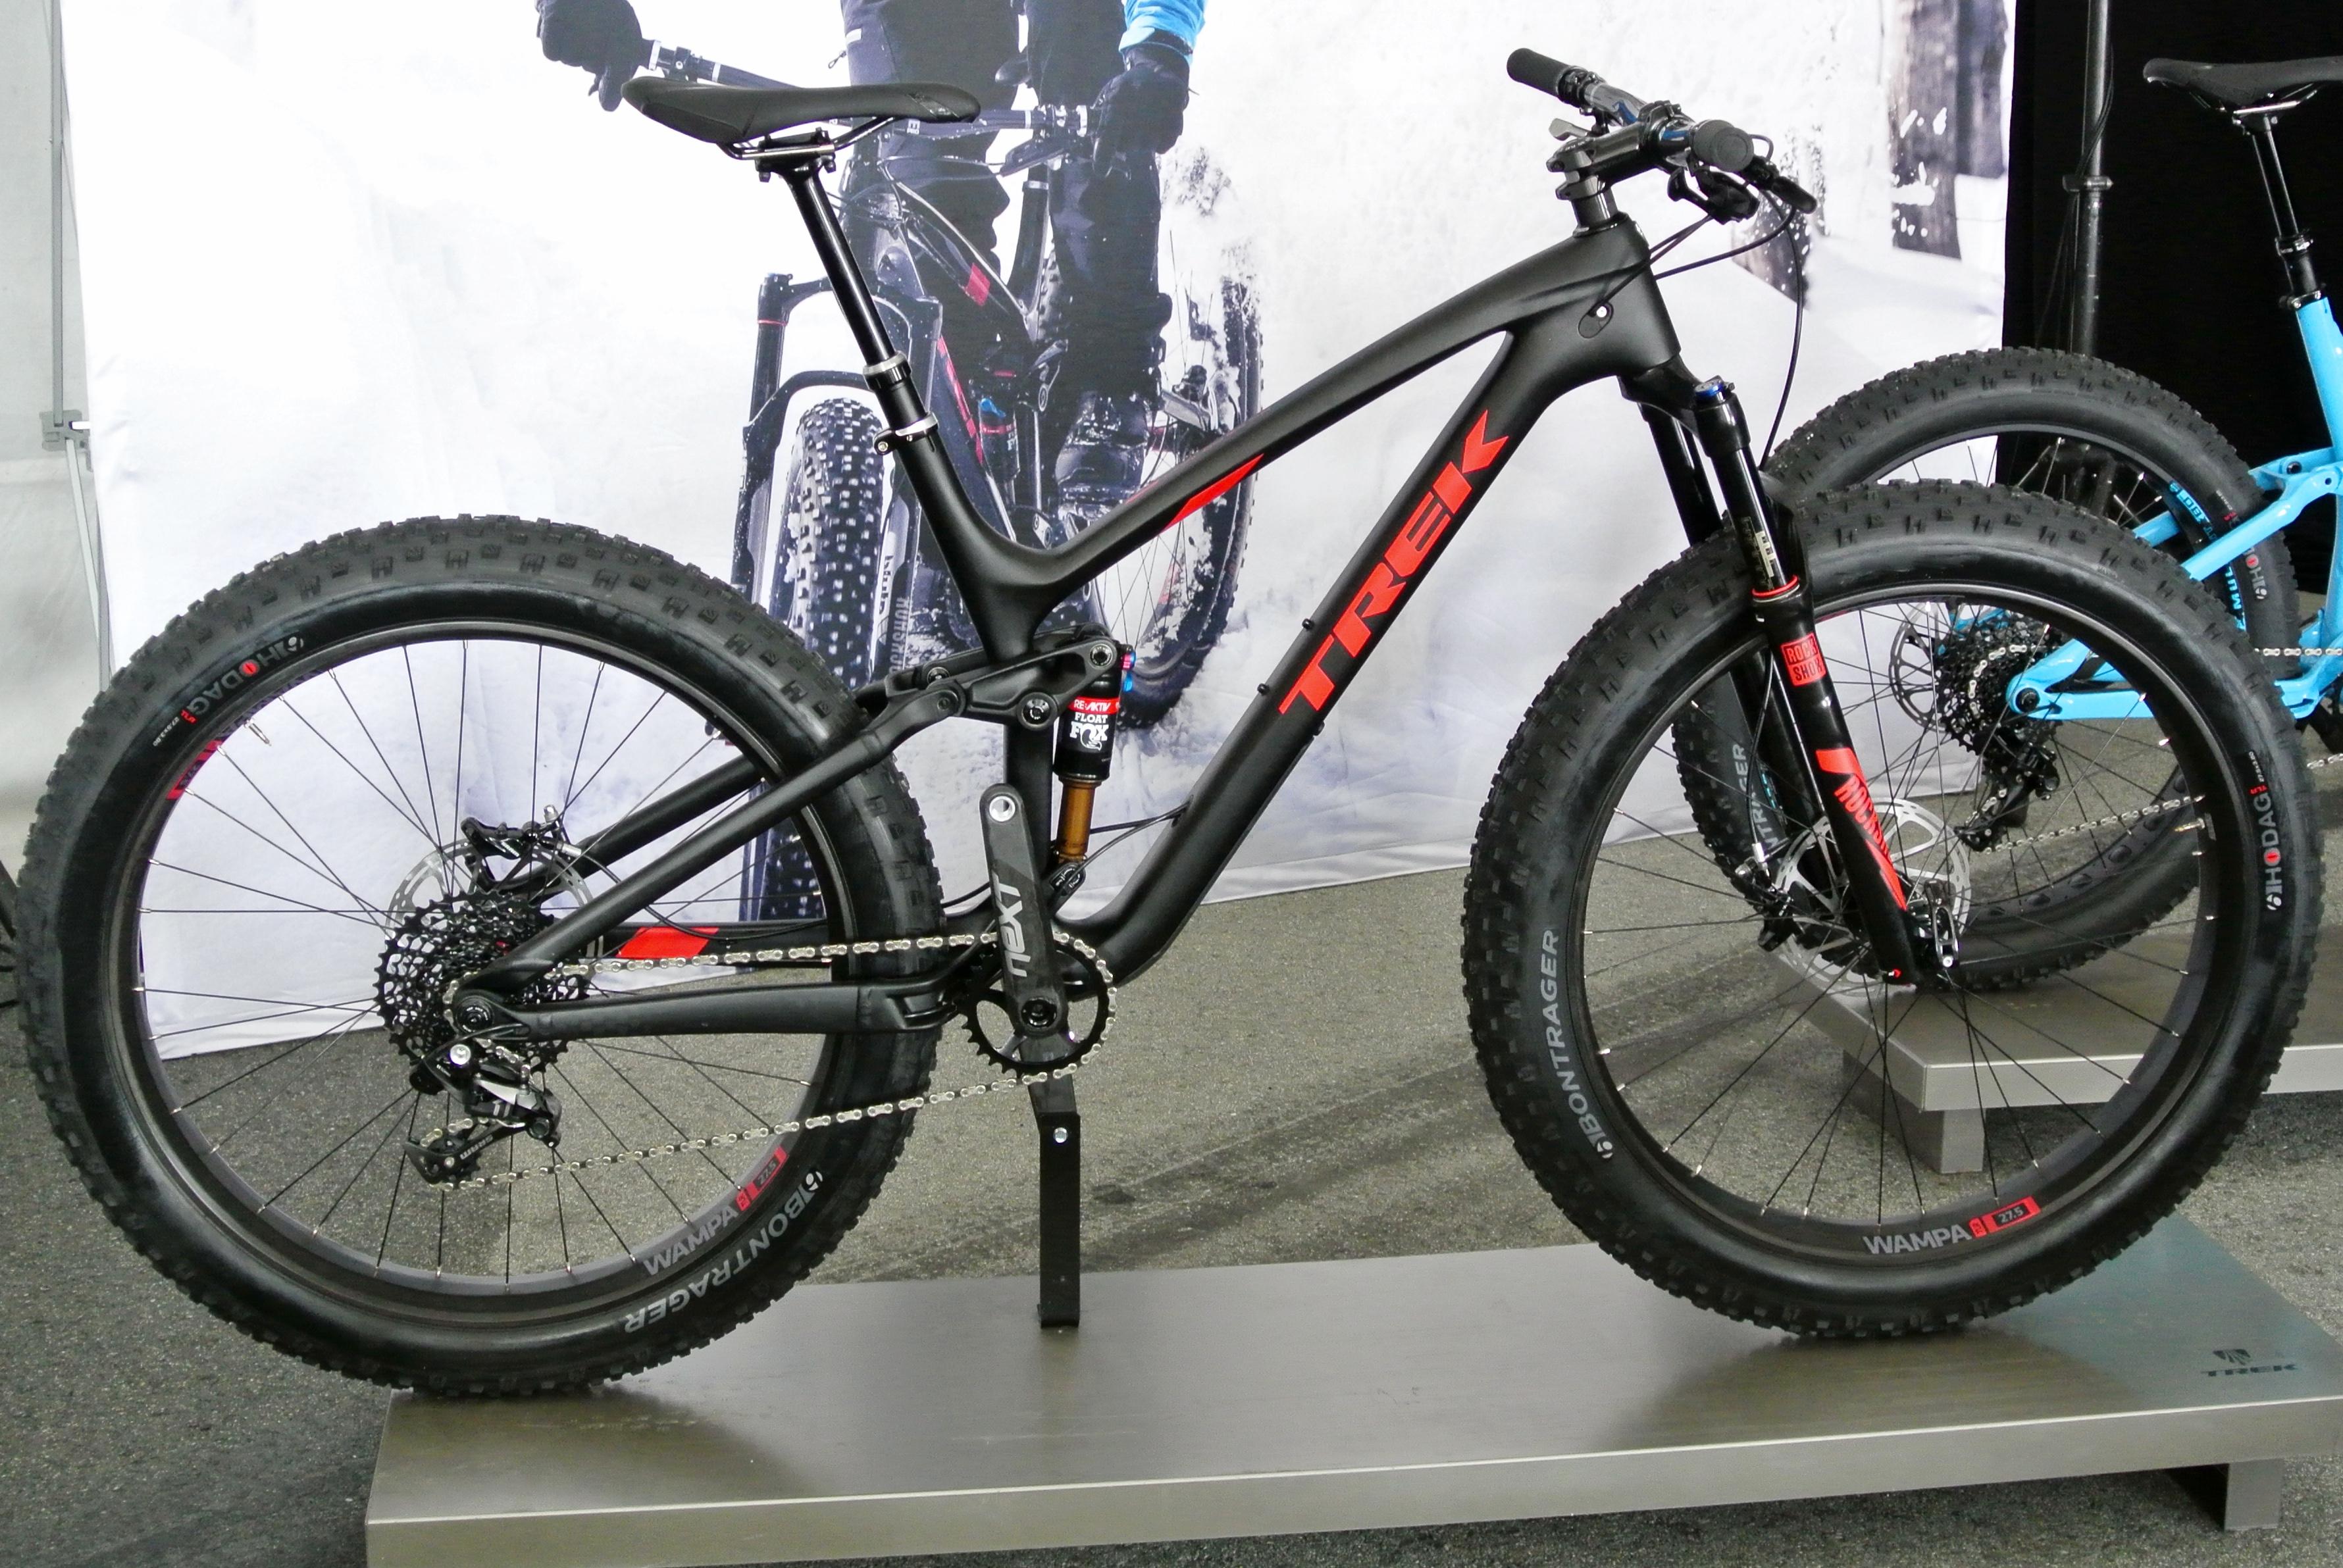 Trek Launches All New Full Suspension Fat Bike The Farley Ex